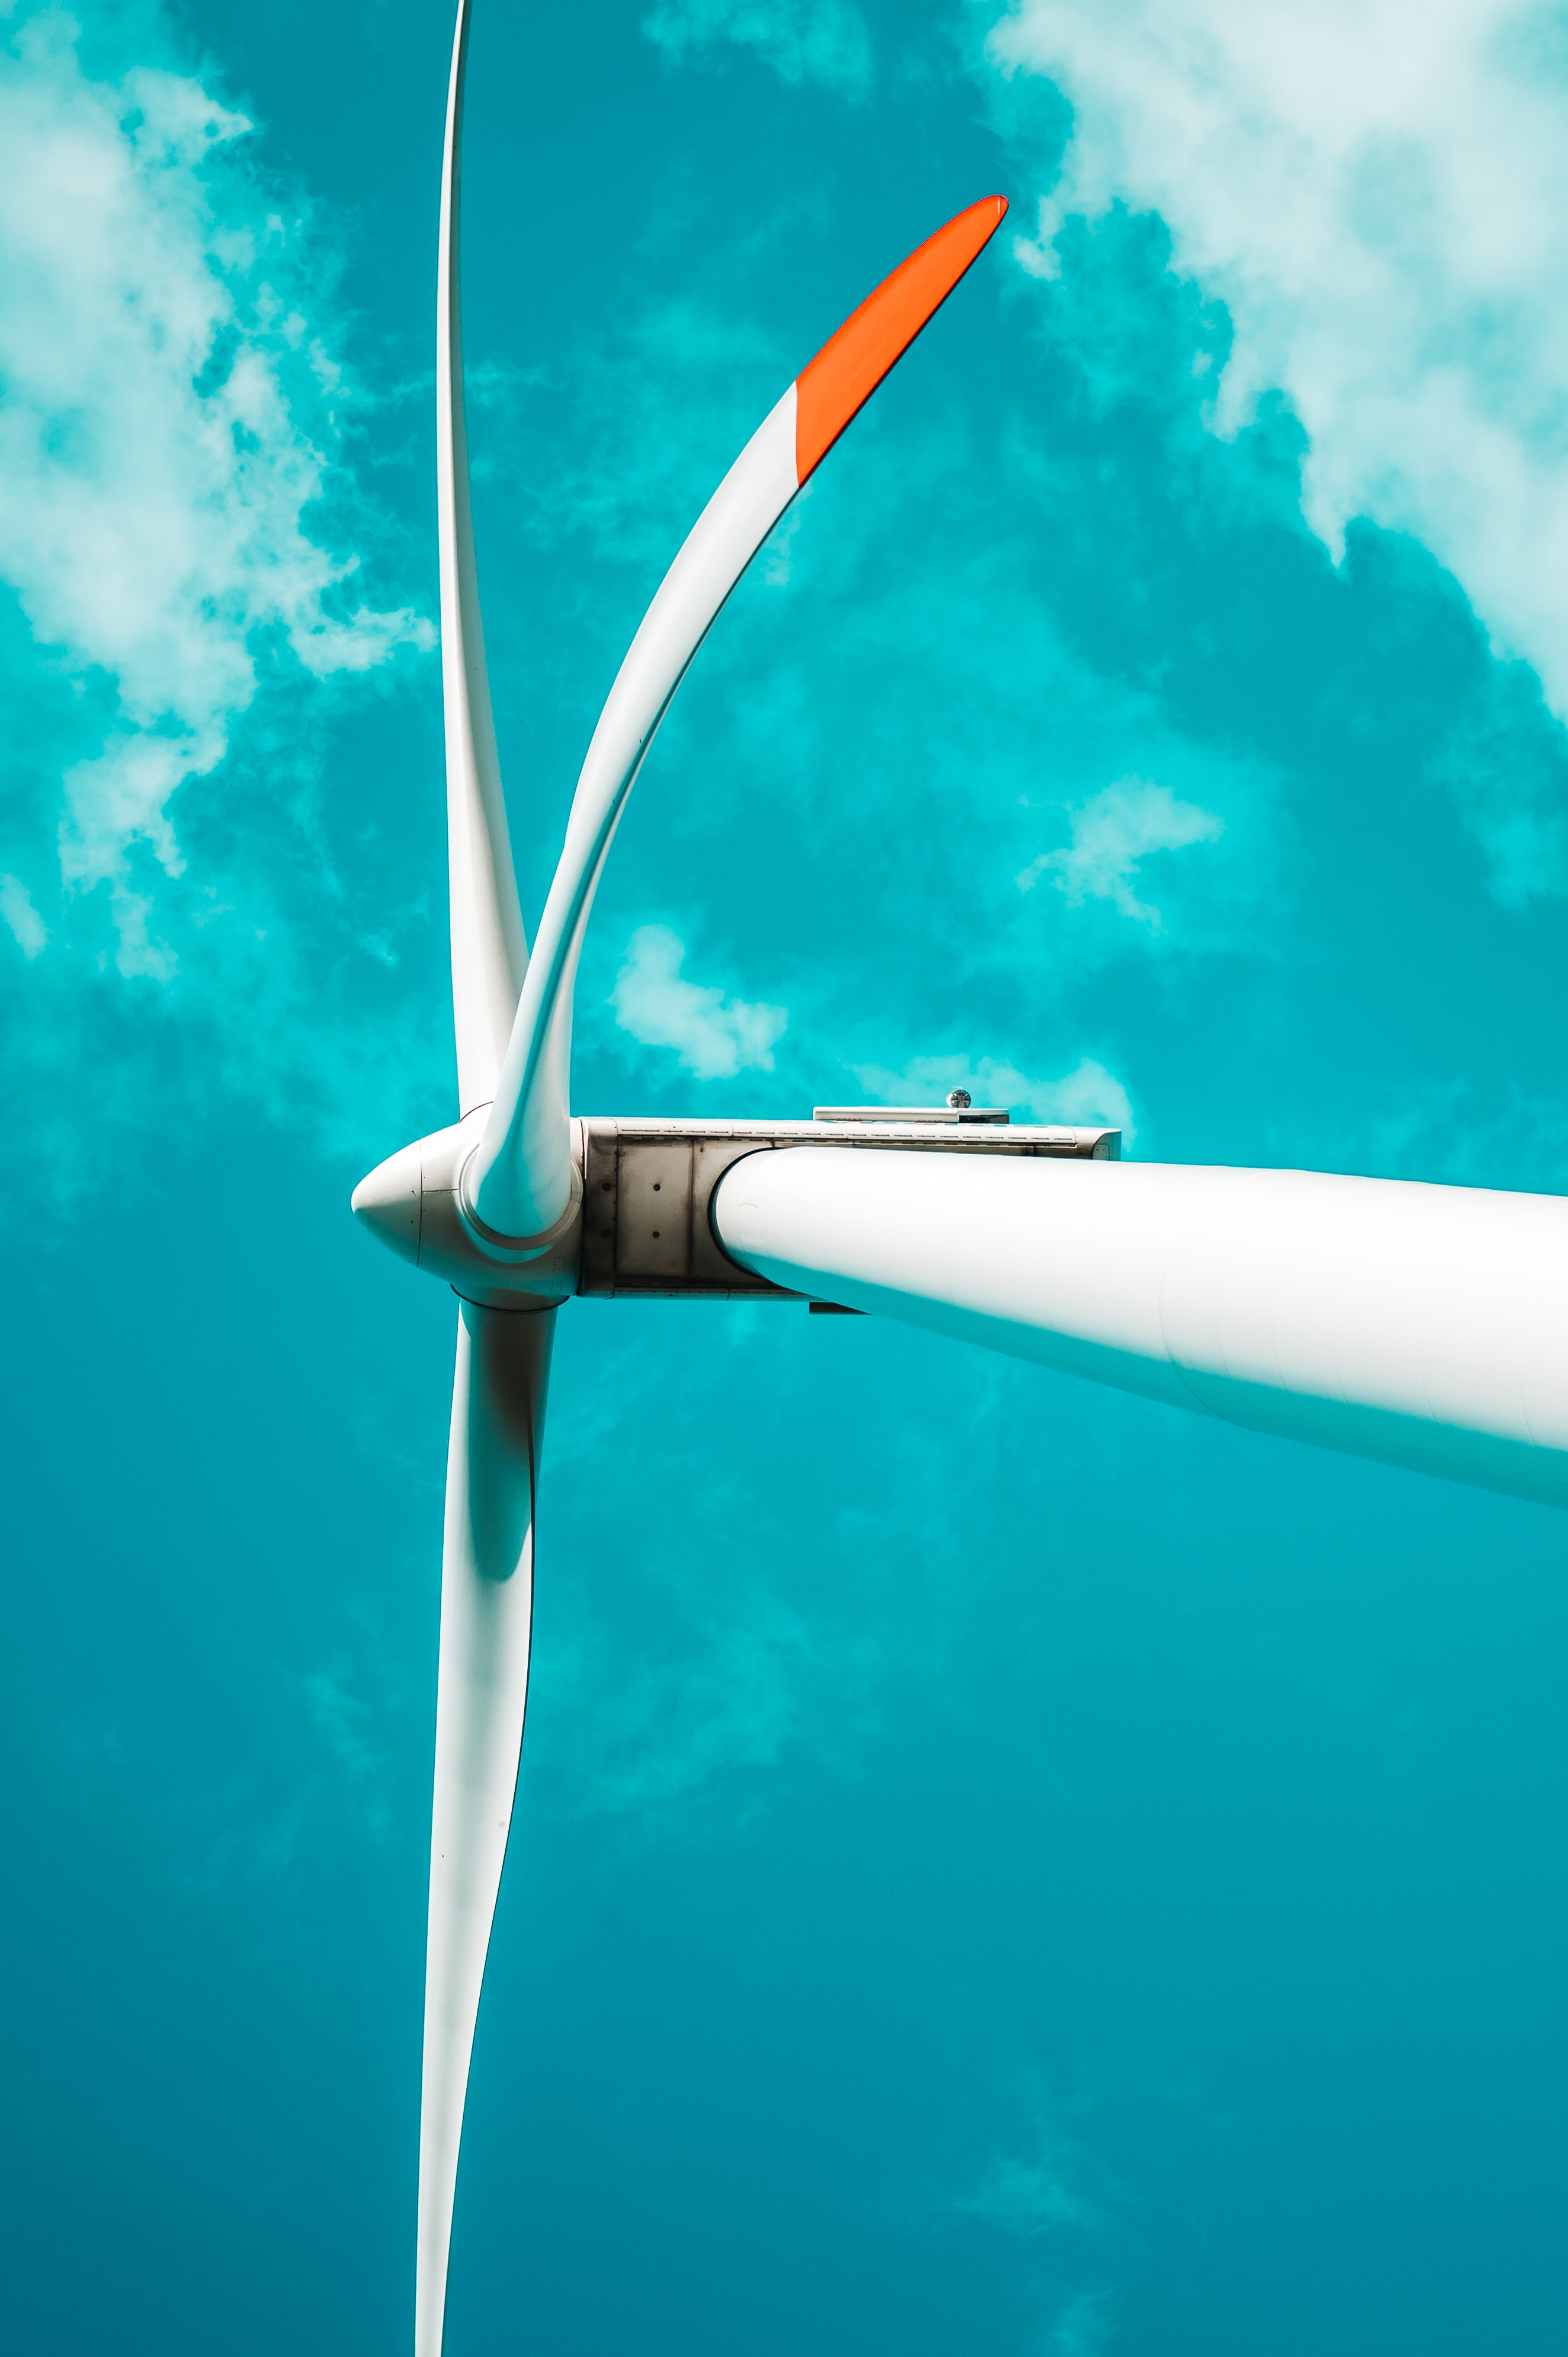 Offshore Wind Factory Credit Jan Kopriva via Unsplash